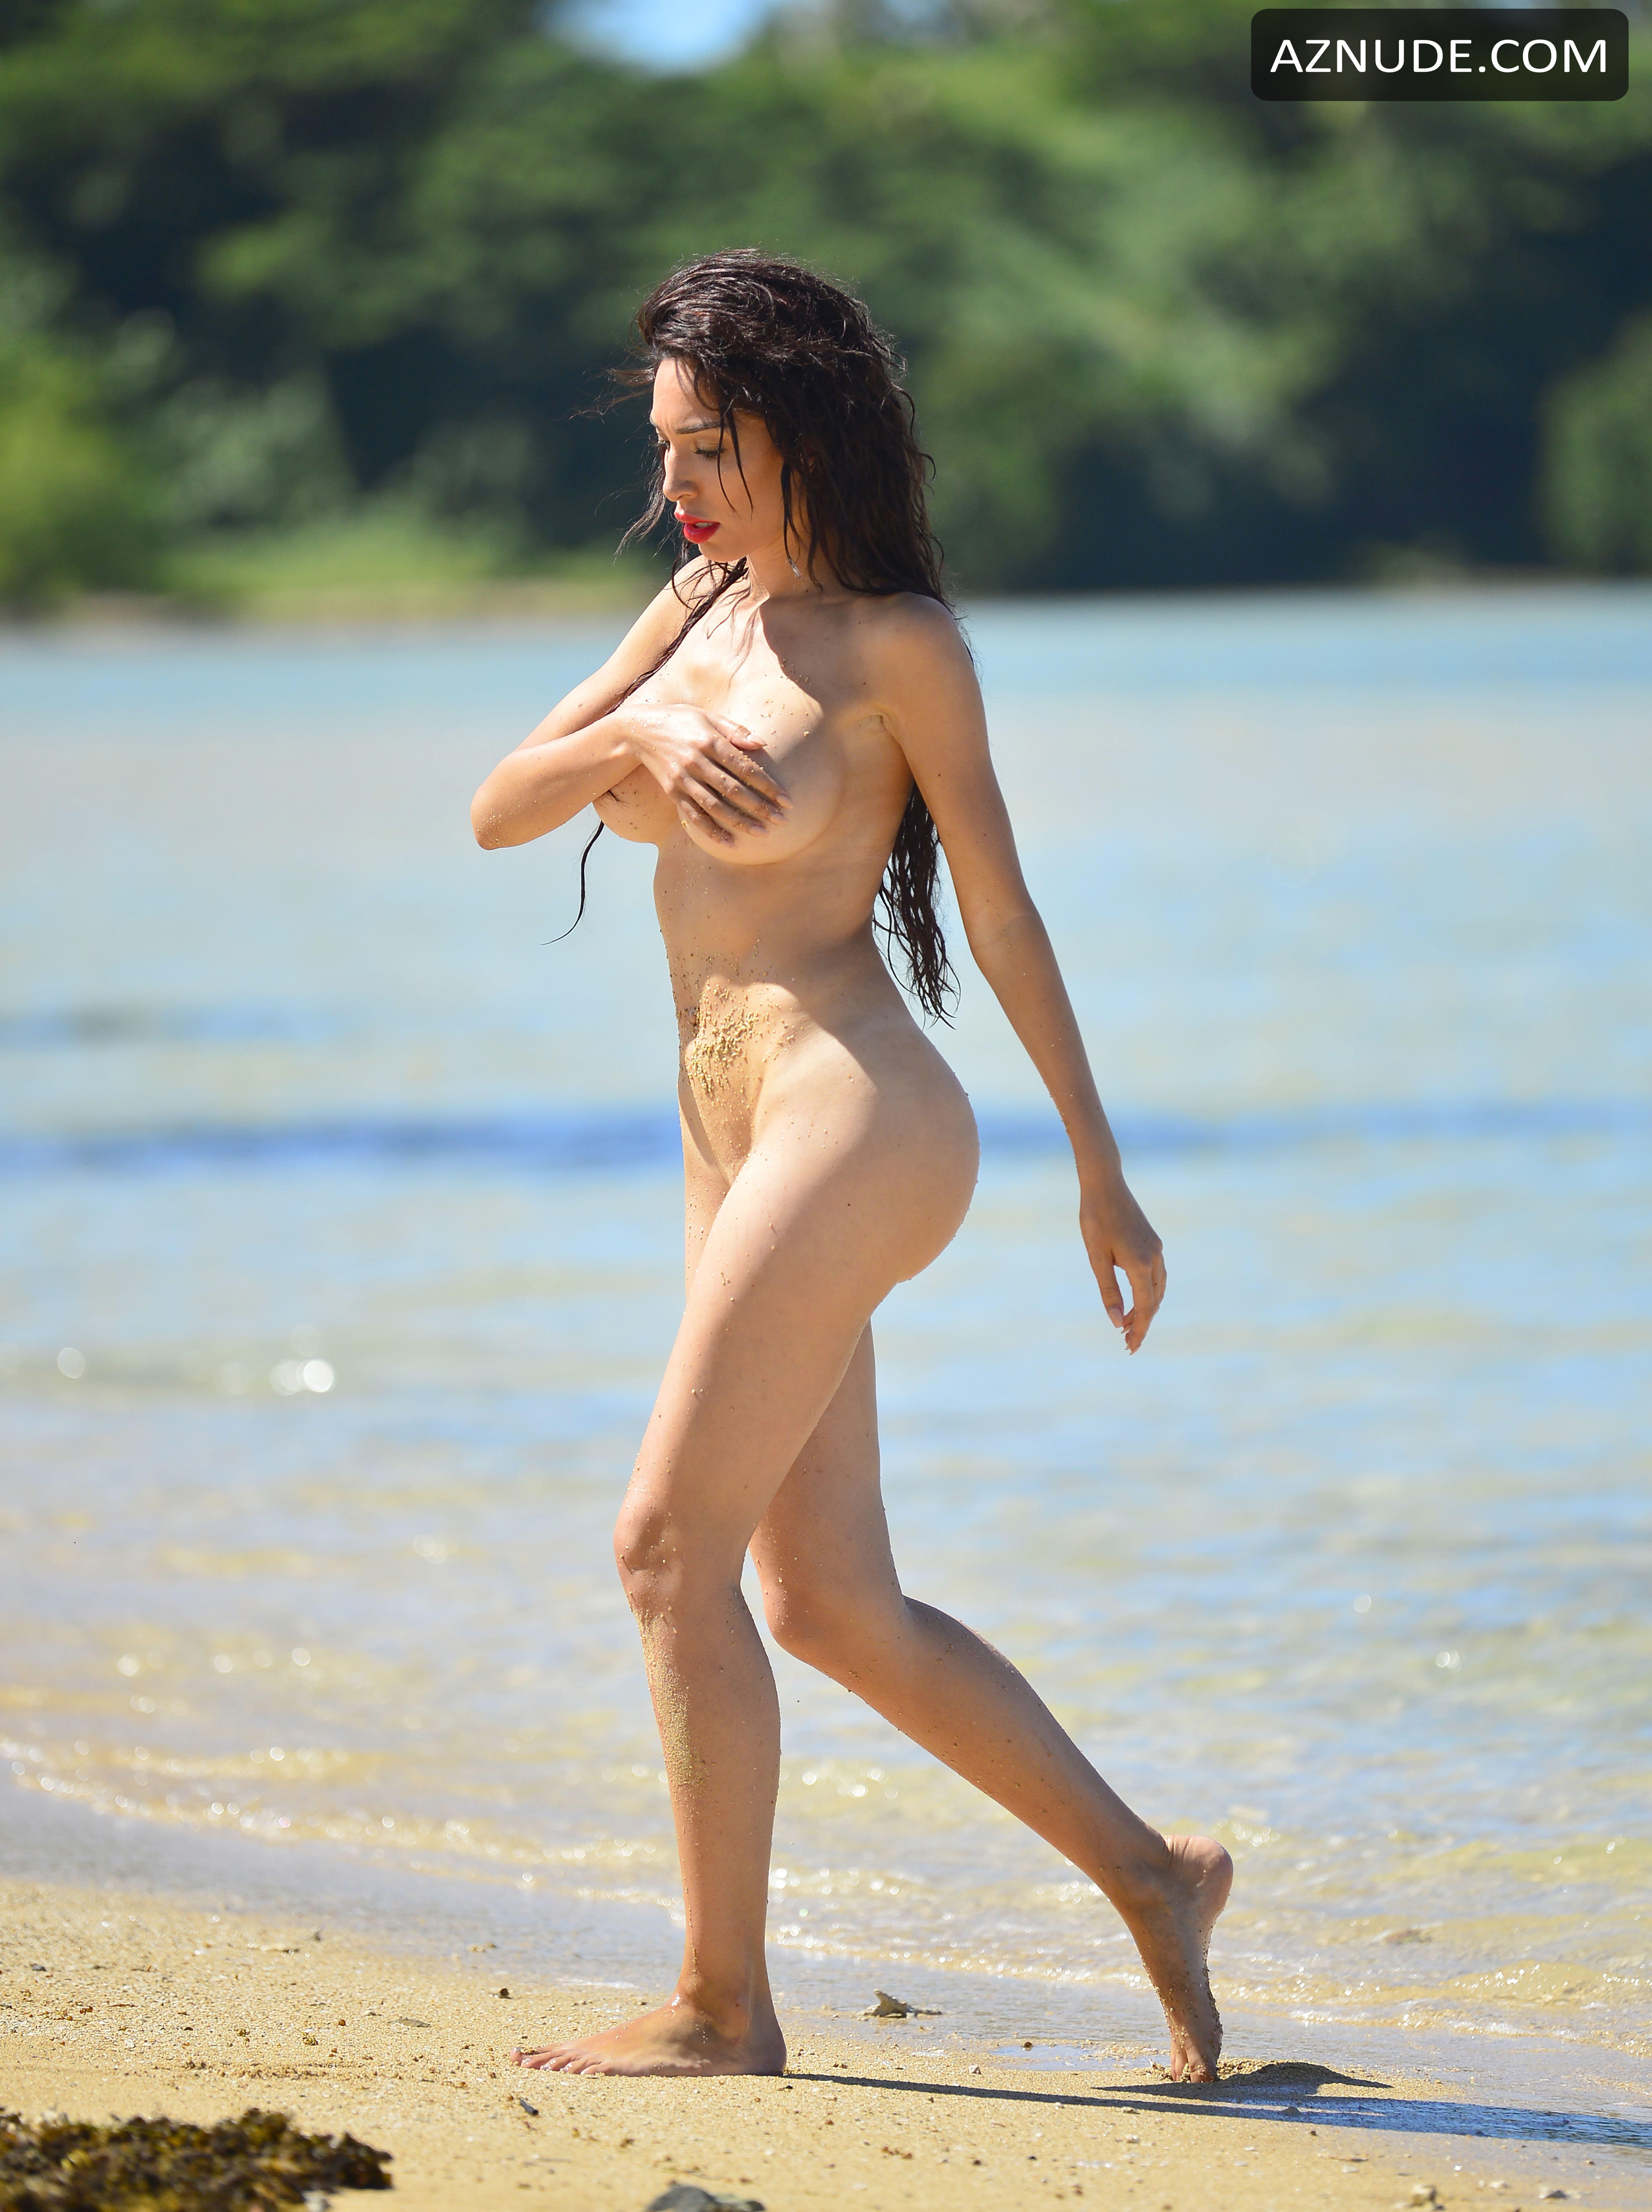 Farrah Abraham Nude During A Raunchy Beach Photoshoot In -4289